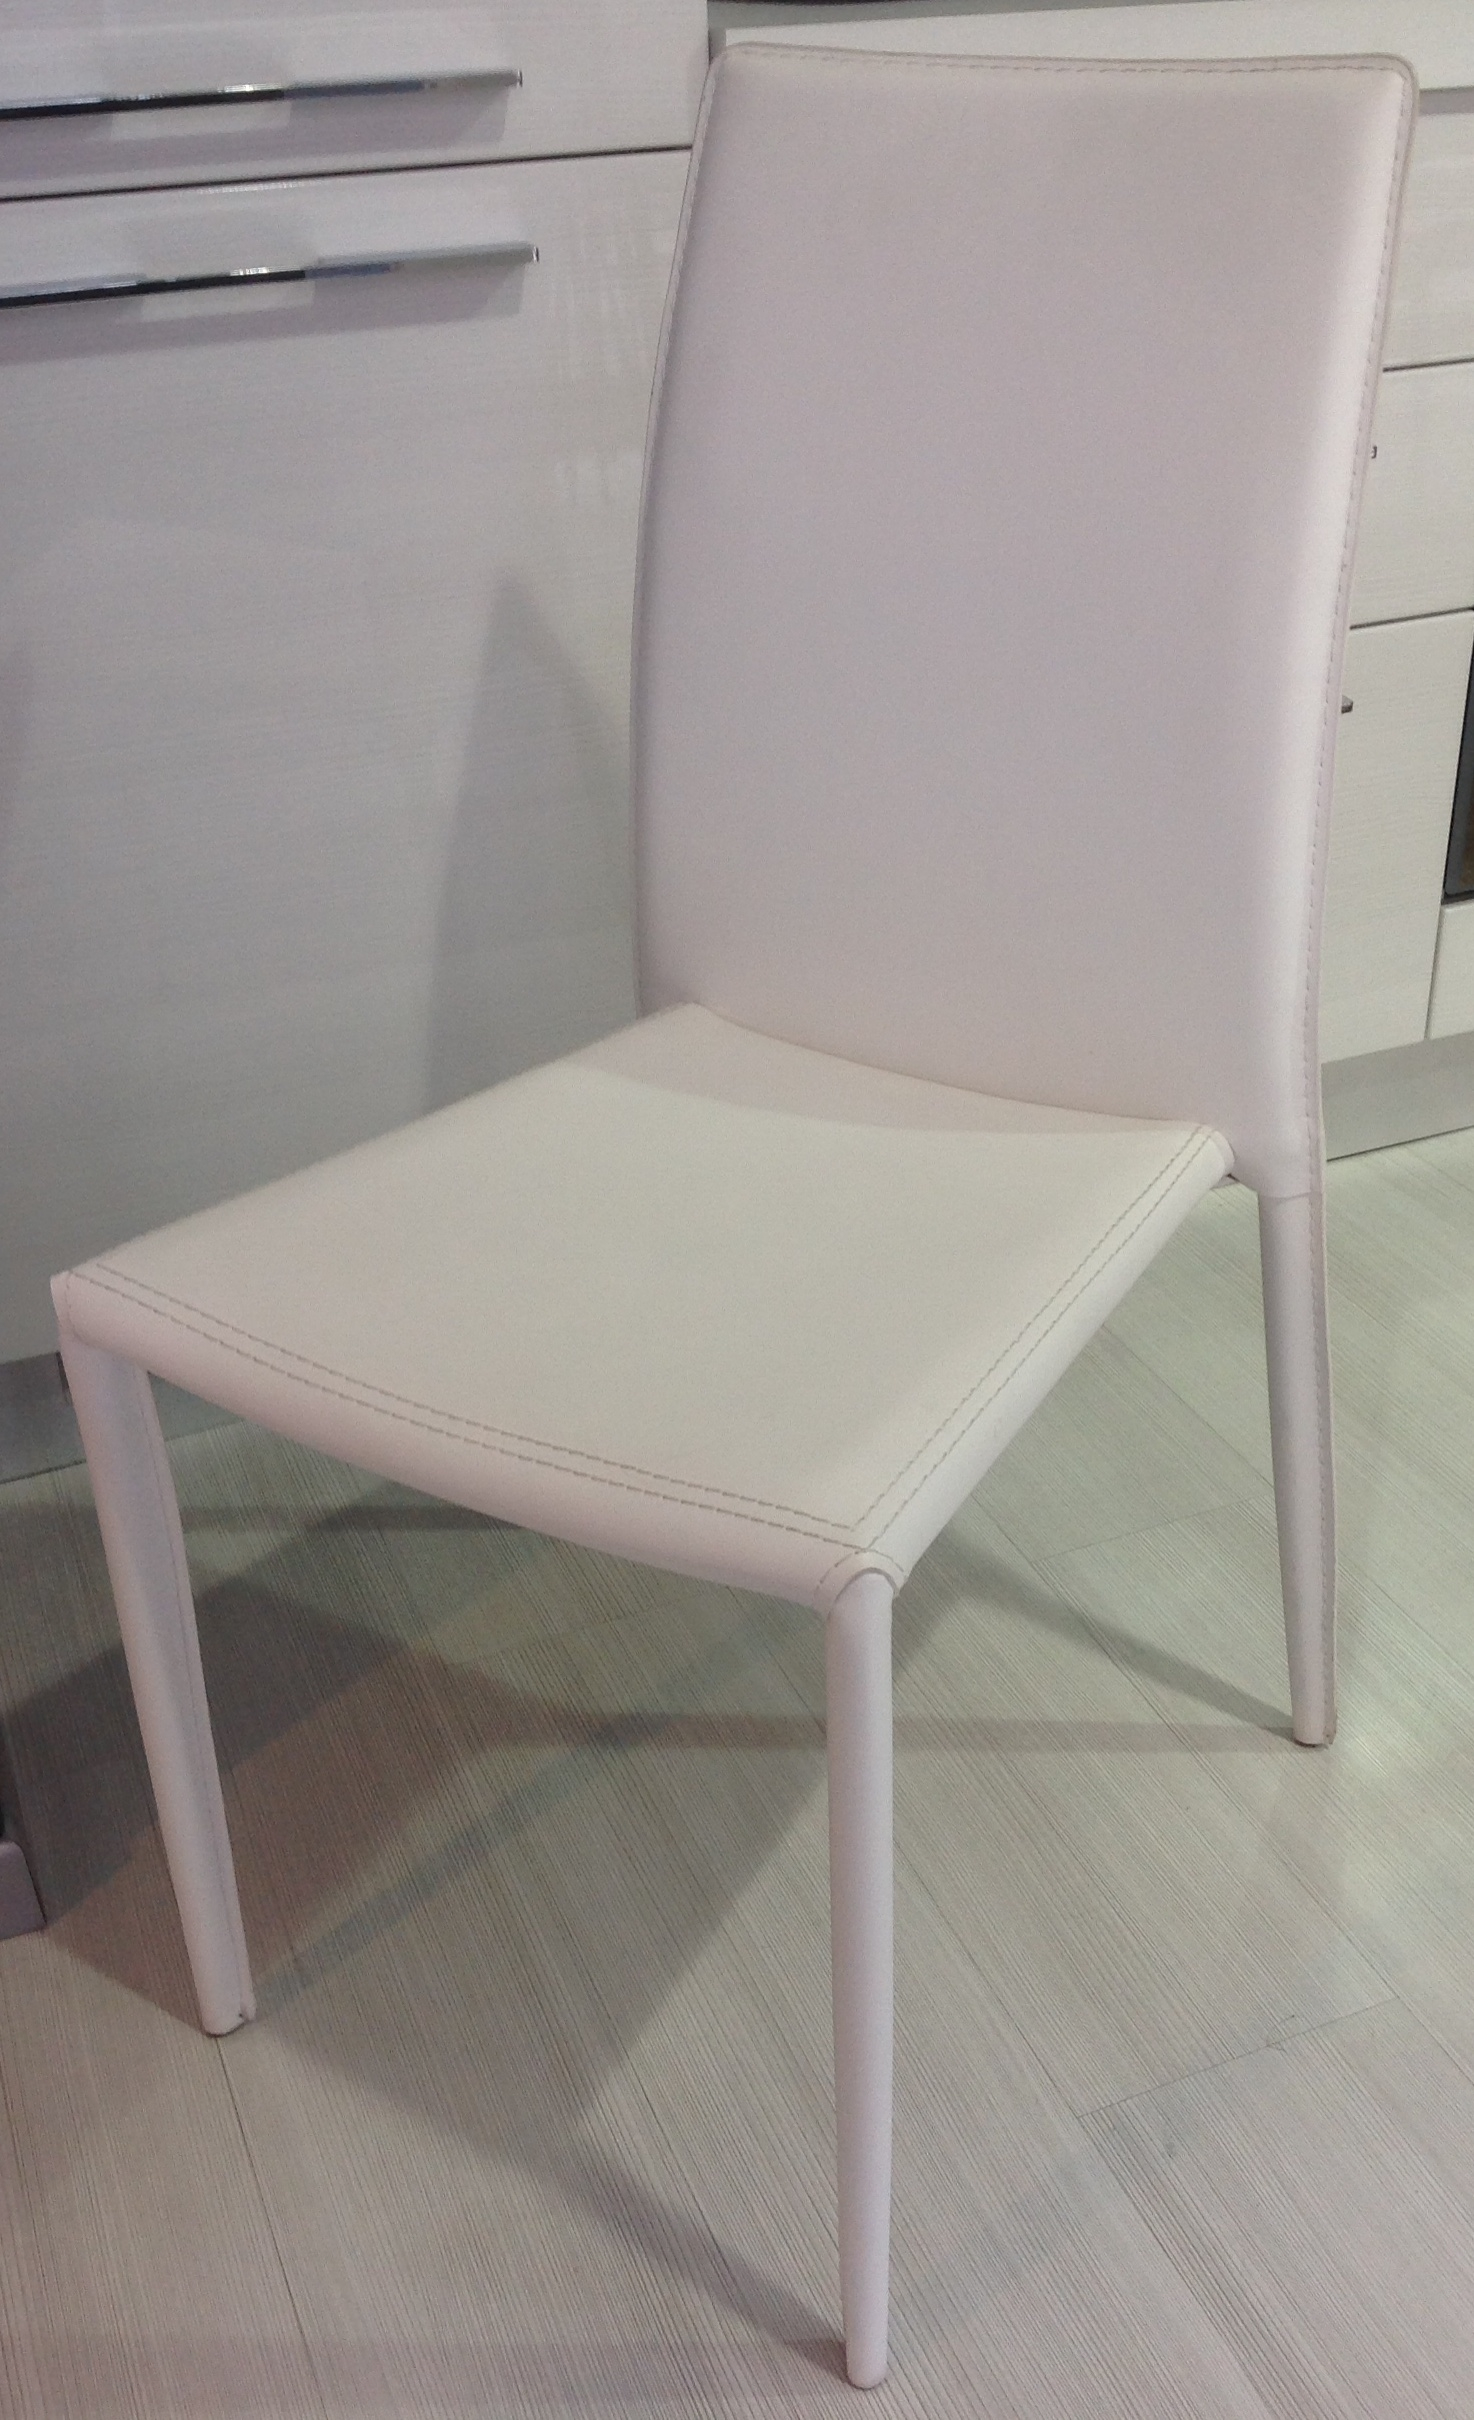 Sedie da cucina in ecocuoio colore bianco - Sedie a prezzi scontati